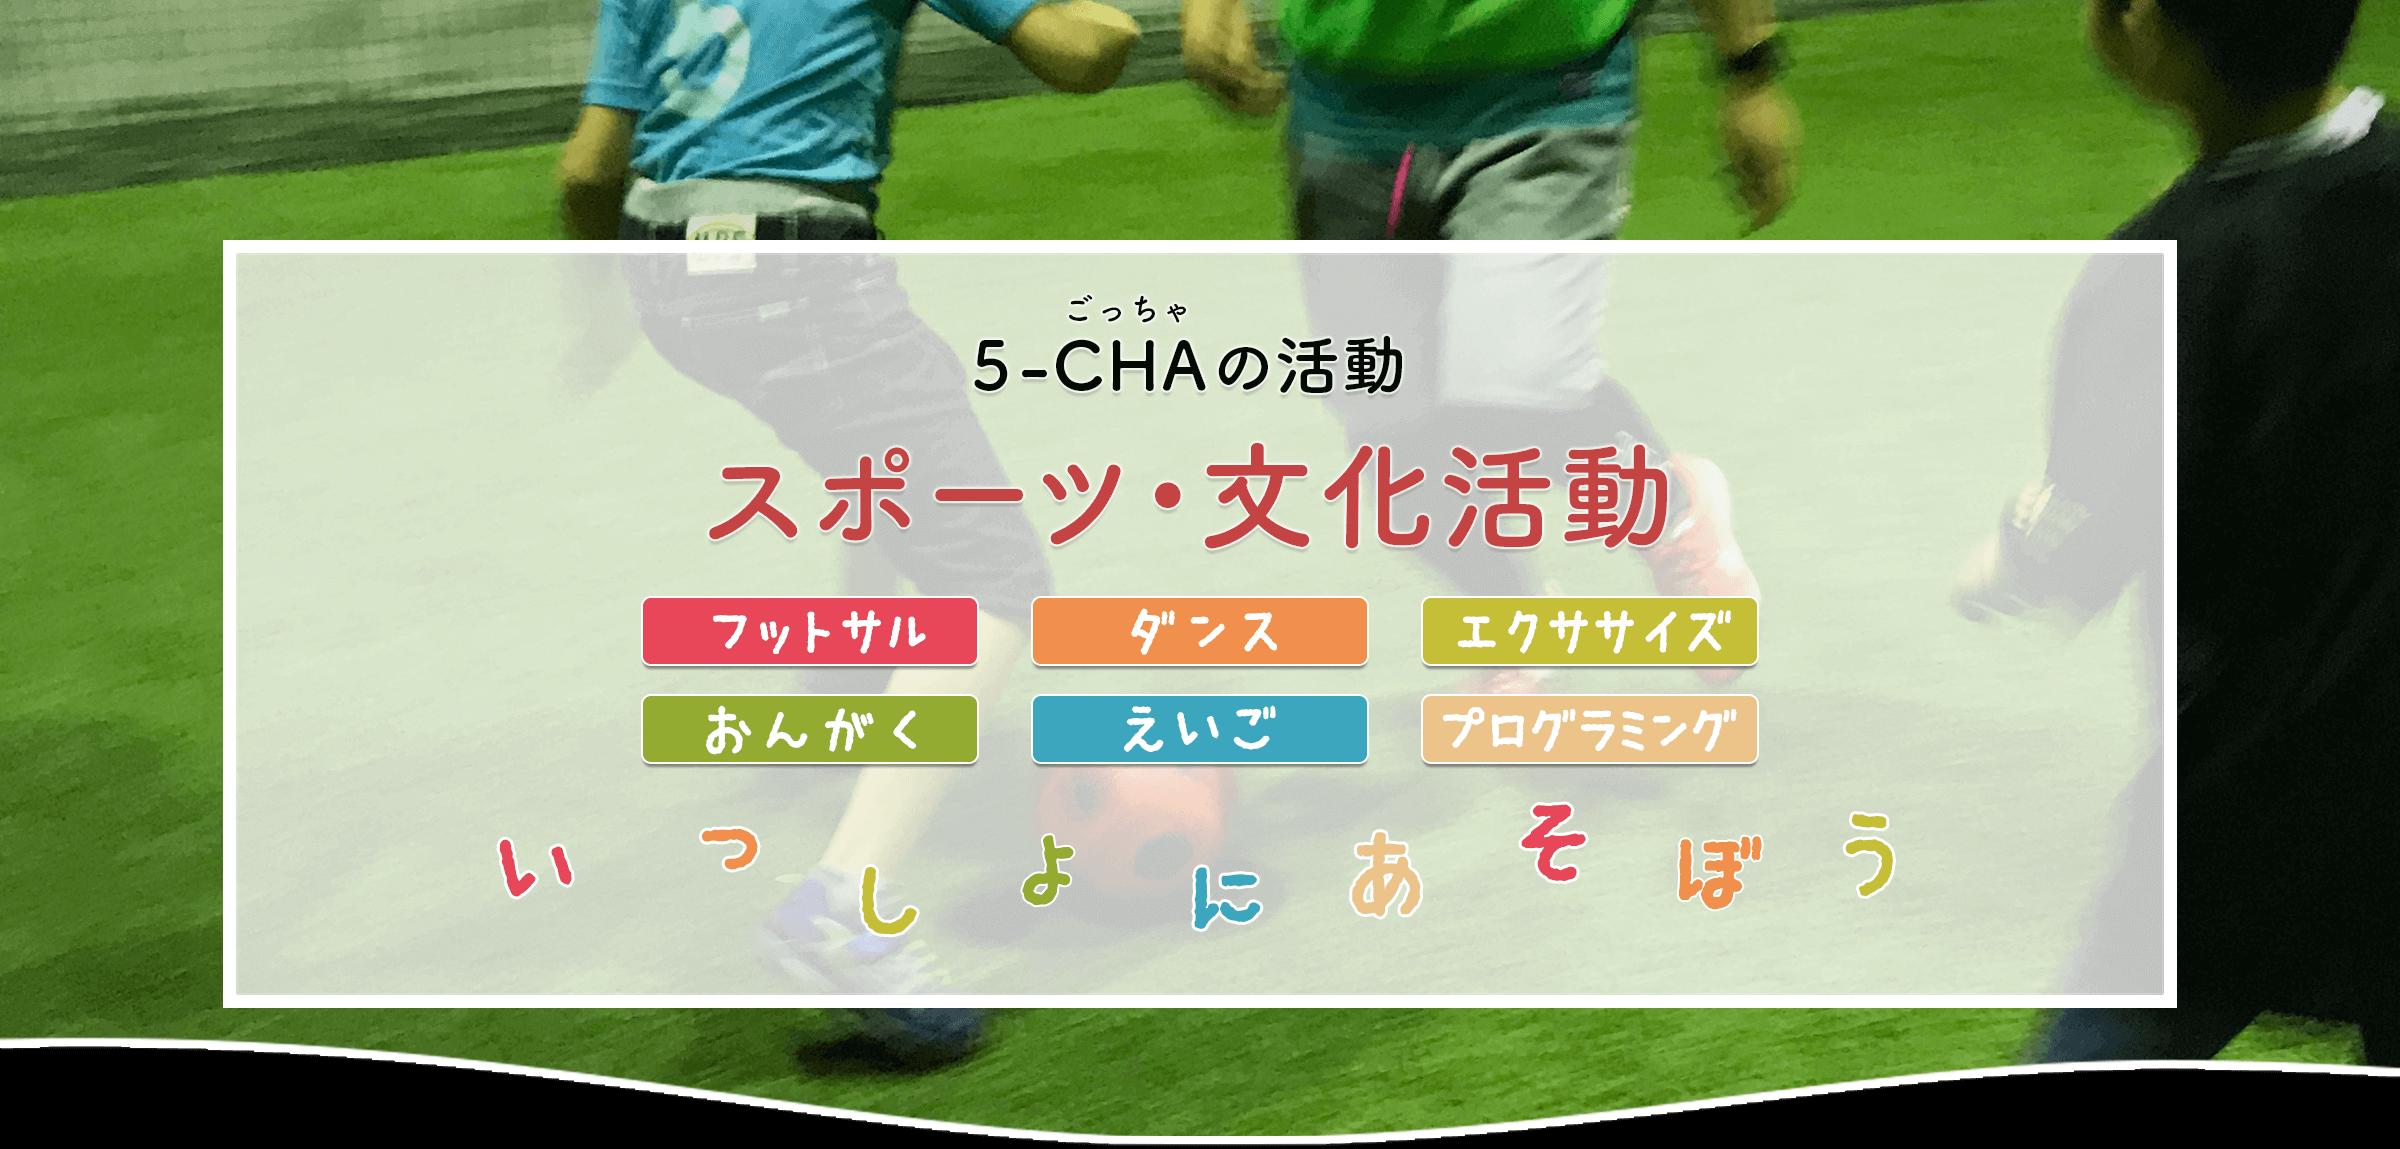 5-CHAの活動 スポーツ・文化活動 いっしょにあそぼう